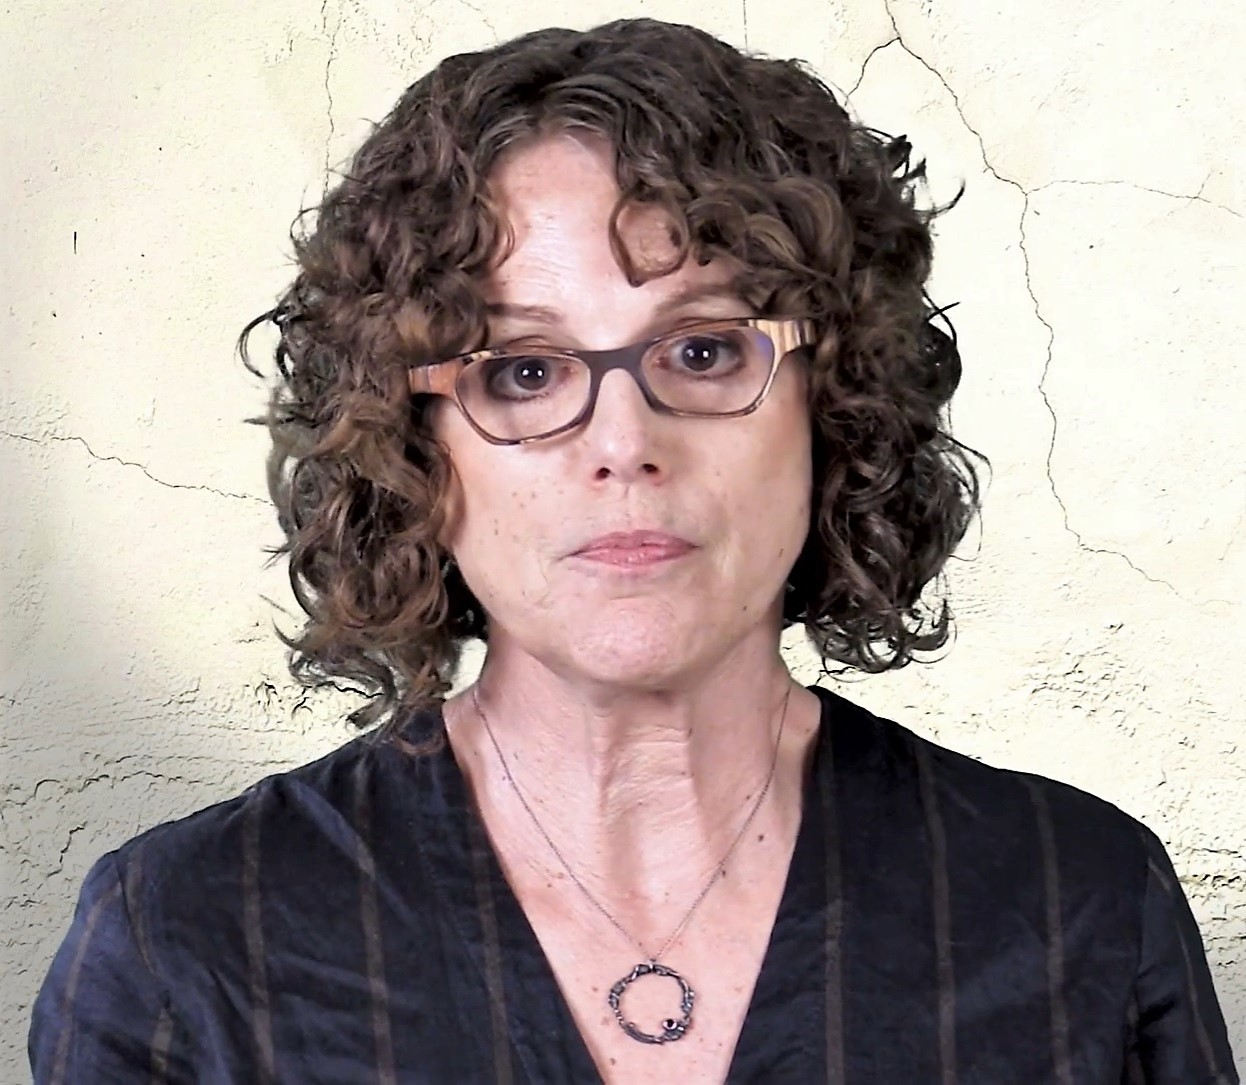 White Anti-Racism Author Has Dirty Secret